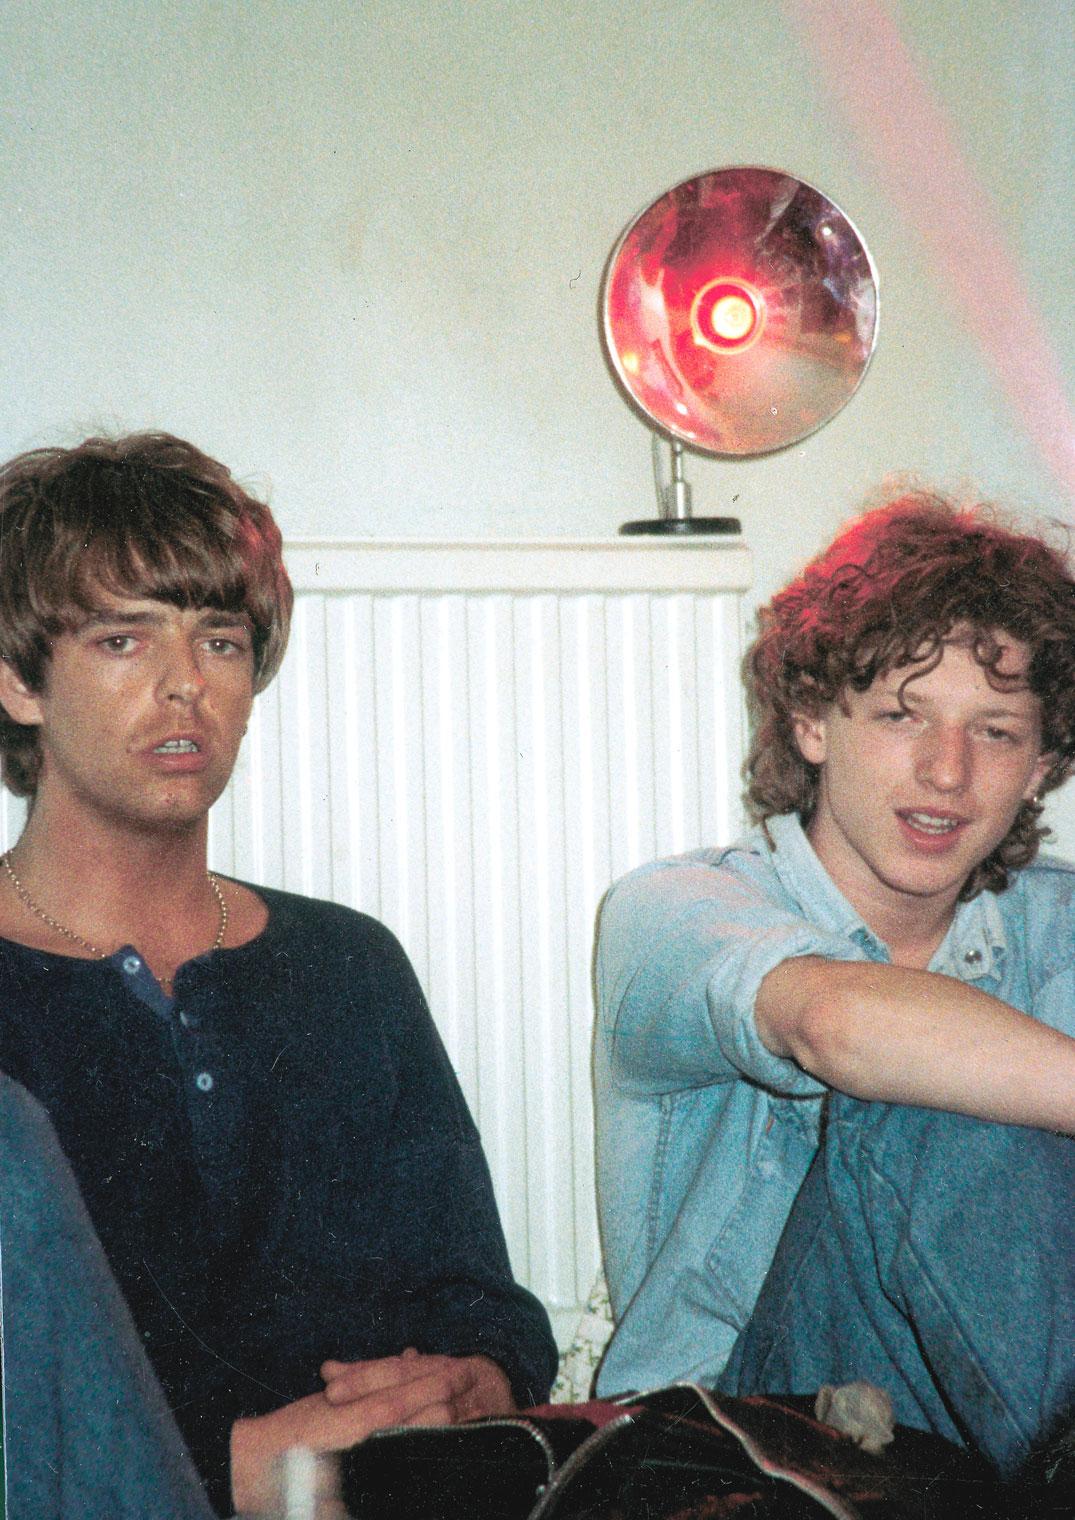 12 Lee Mavers & John Power_Andy Summerton 21st Birthday, 11 June 88.jpg